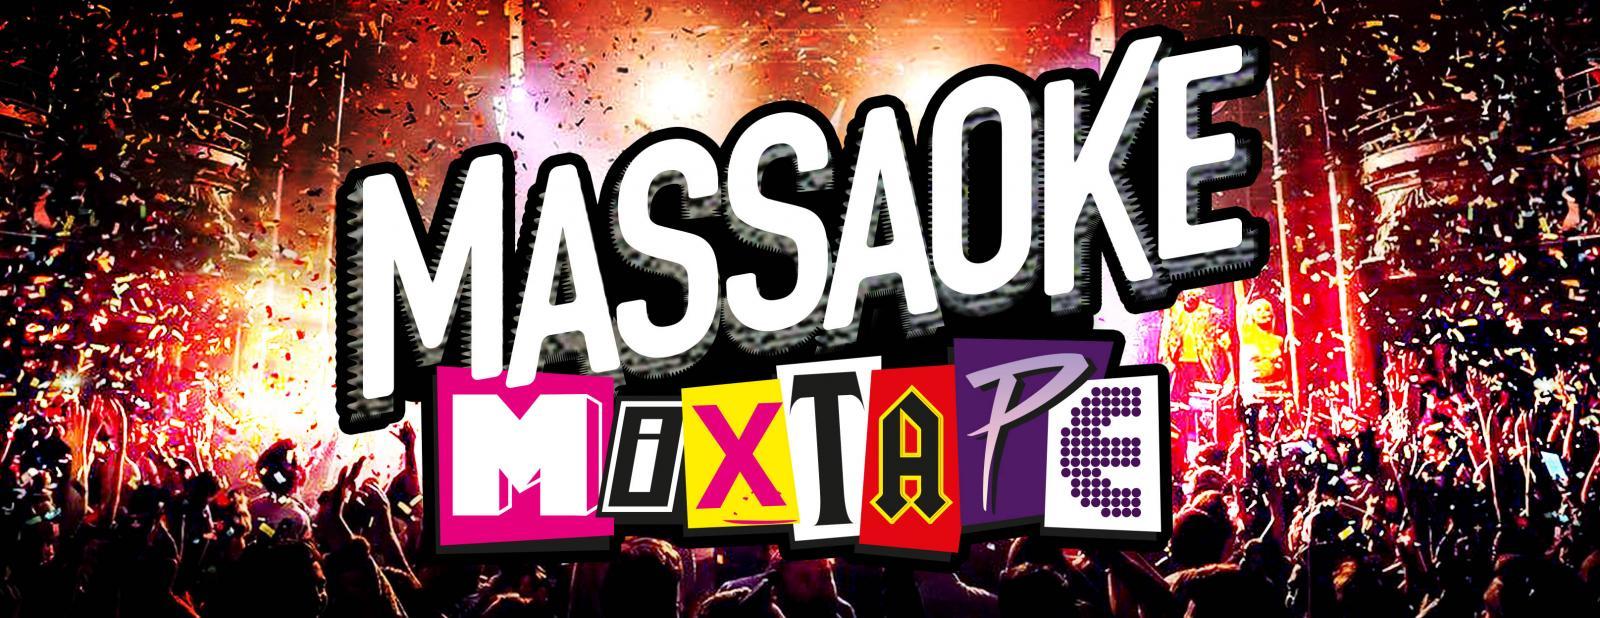 Massaoke-Mixtape-1440x440-v1 copy.jpg